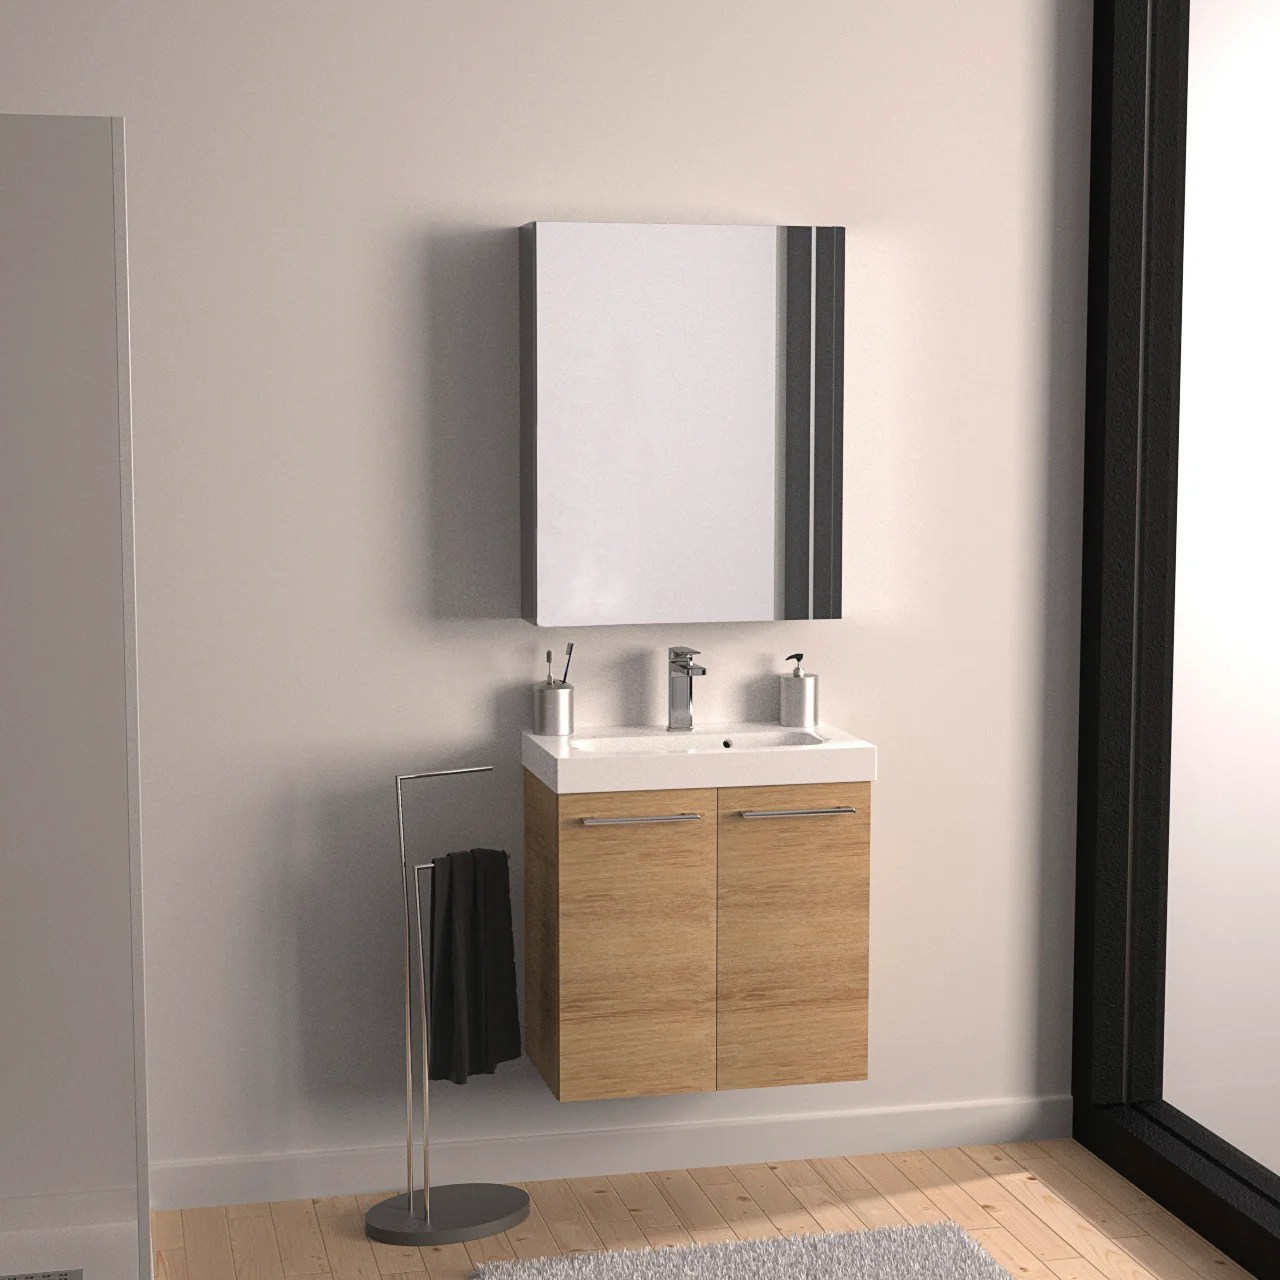 Meuble Simple Vasque L 120 X H 58 X P 46 Cm Blanc Remix Leroy Merlin